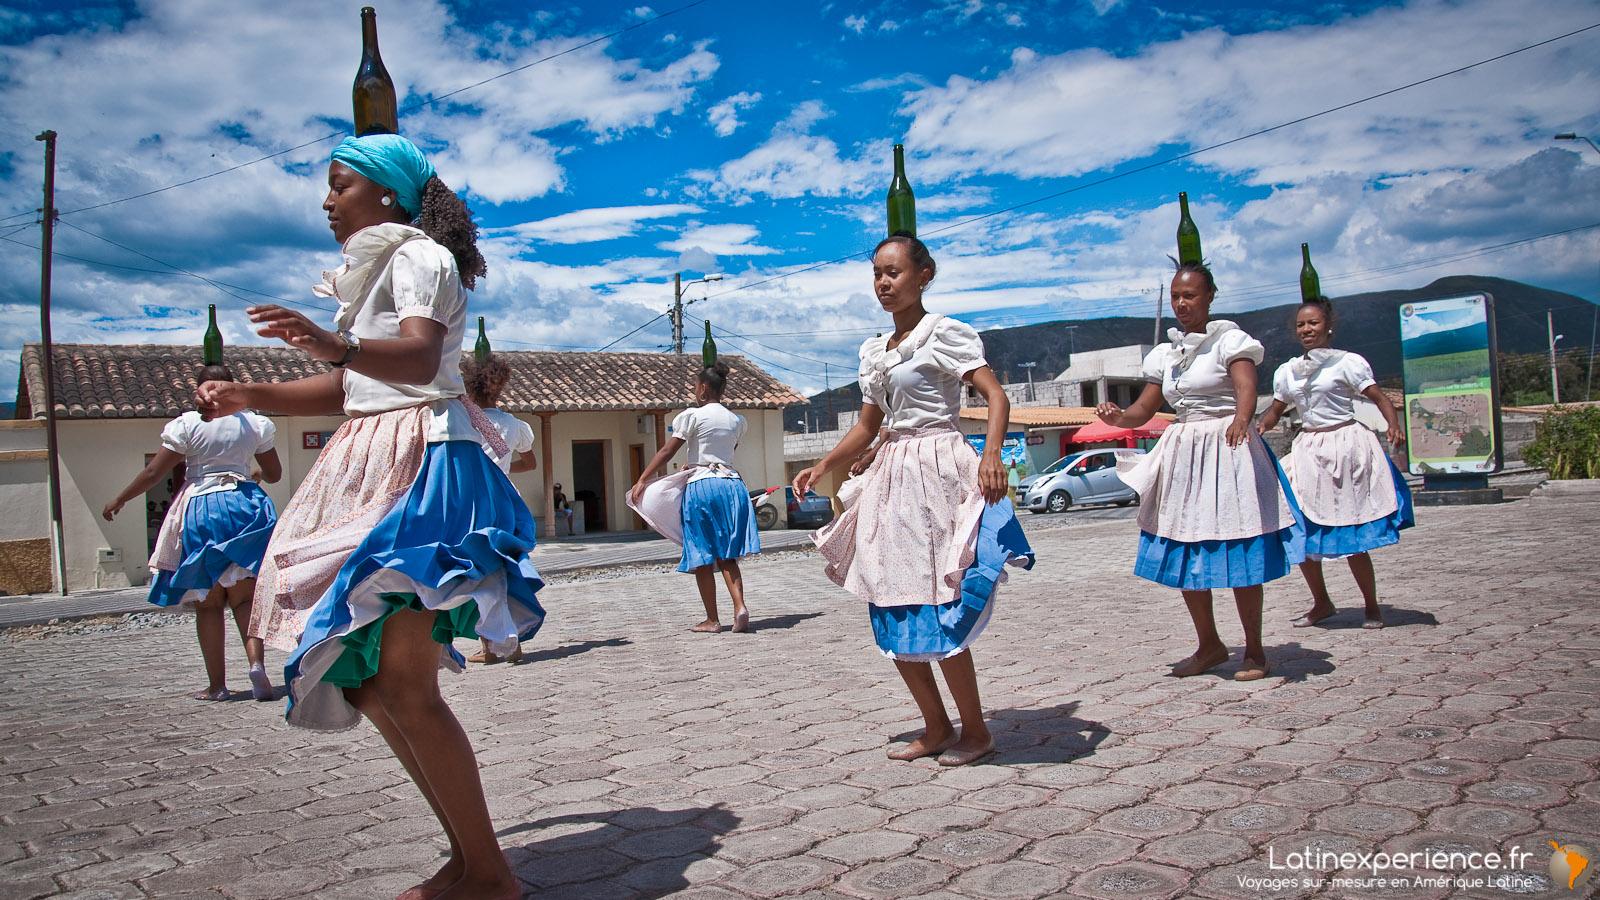 Equateur - Salinas -  Danse folklorique - Latinexperience voyage